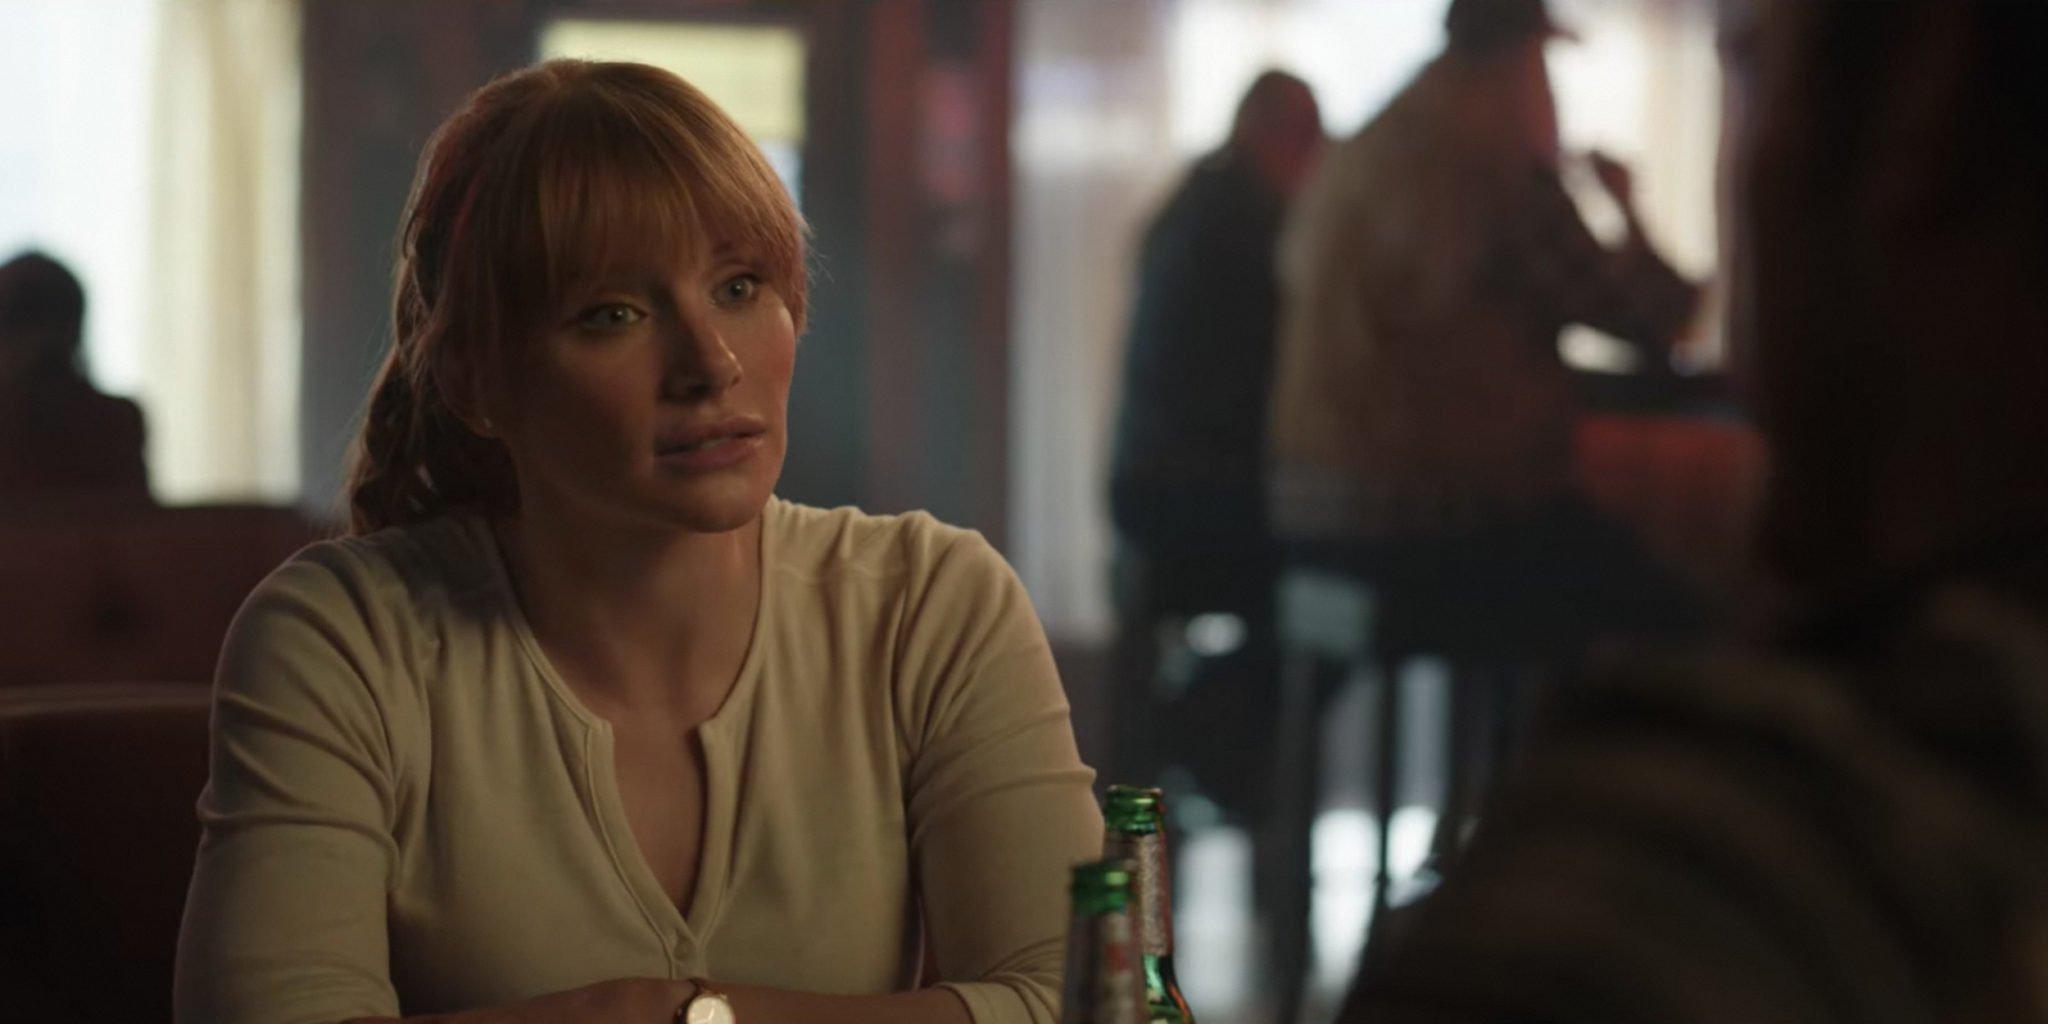 Jurassic World Fallen Kingdom Review Bryce Dallas Howard as Claire Dearing